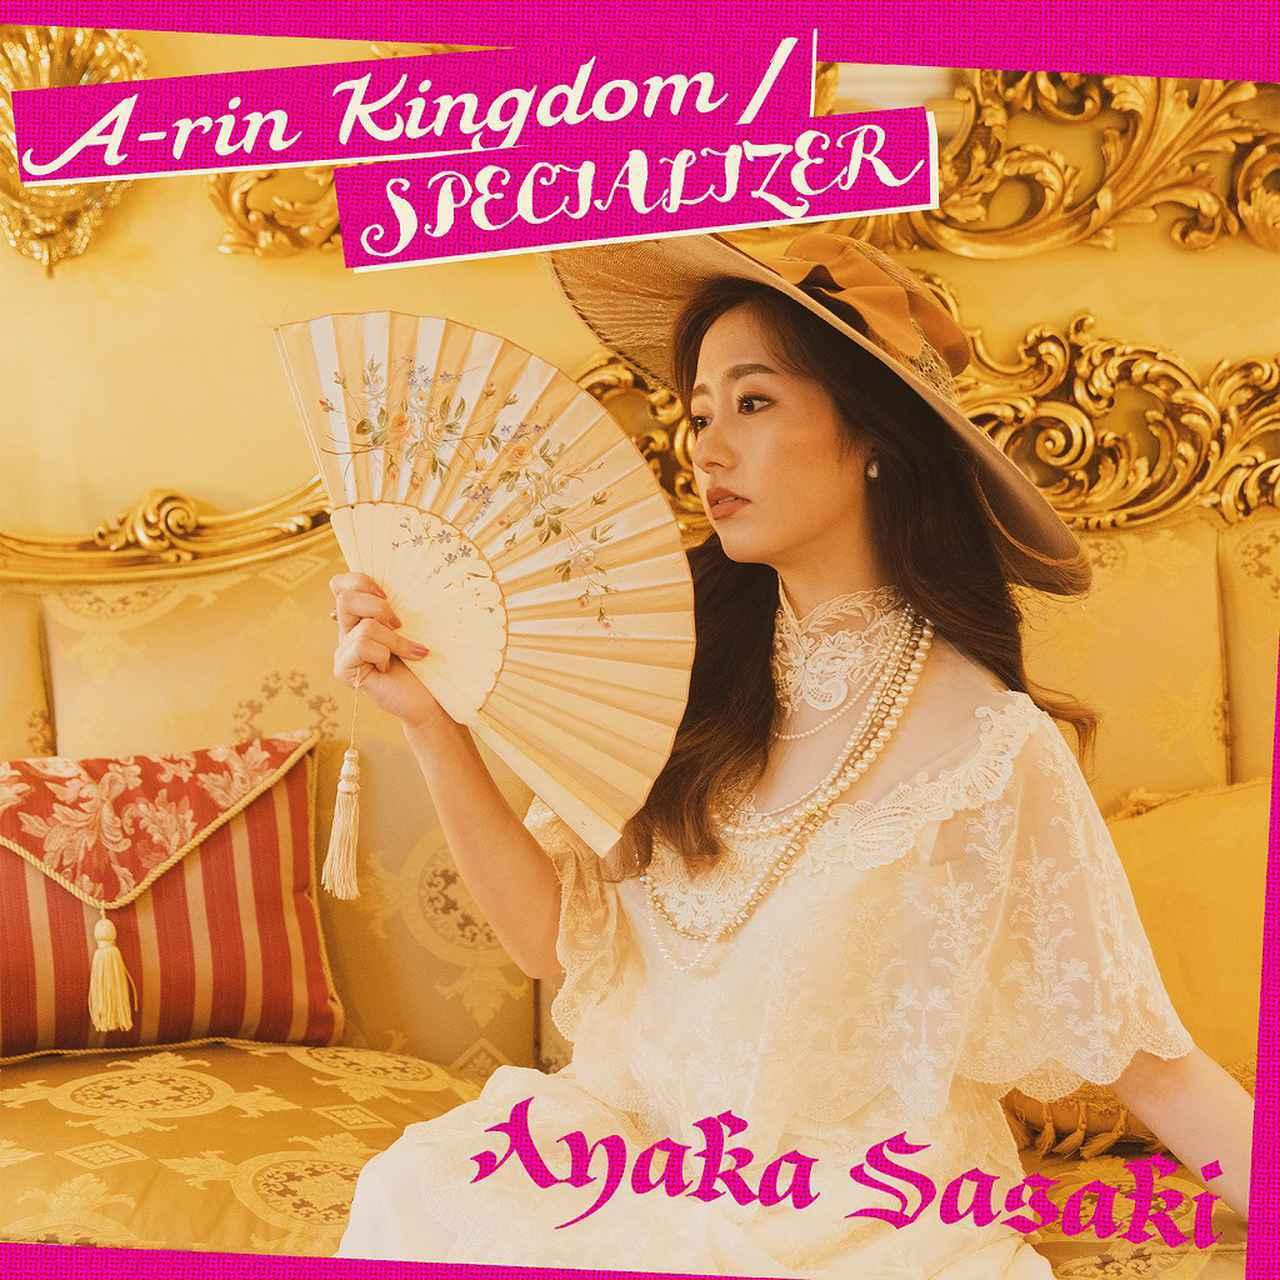 画像: A-rin Kingdom/SPECIALIZER / 佐々木彩夏